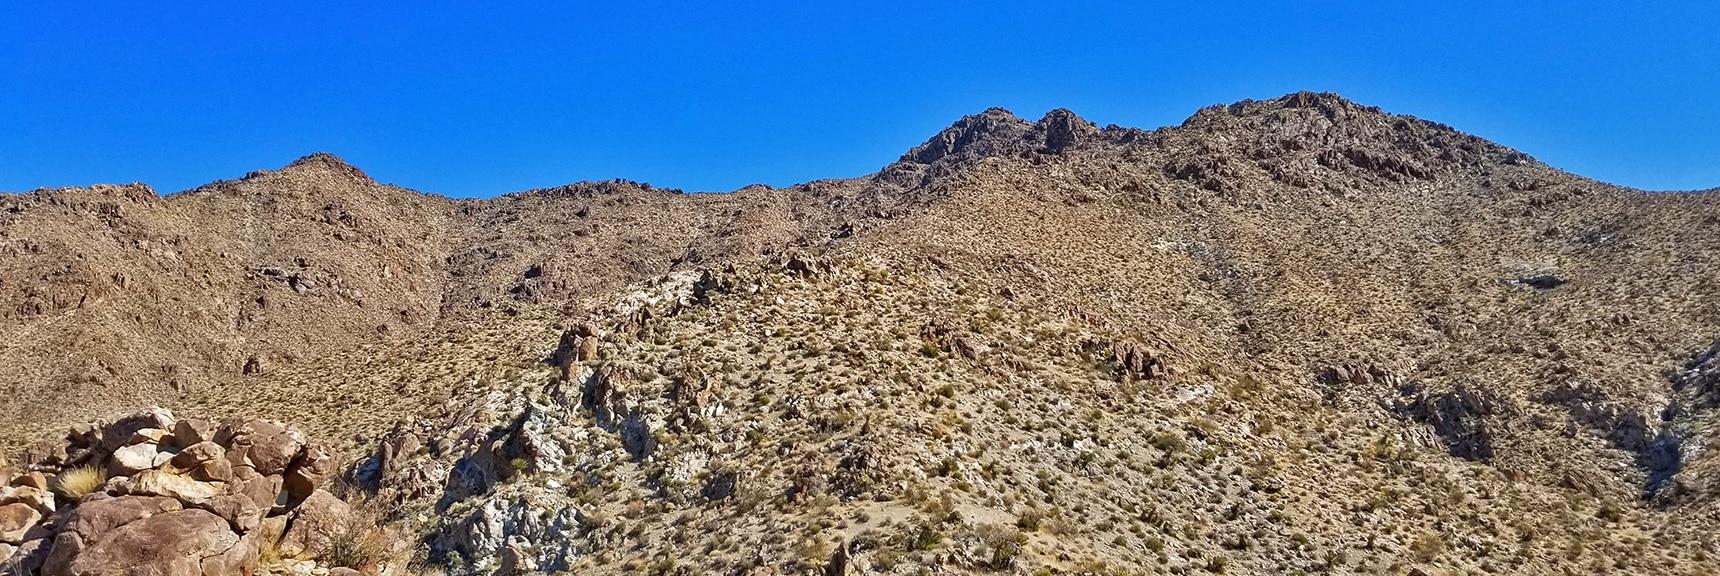 Mt. Wilson Western Approach Ridge | Mt Wilson, Black Mountains, Arizona, Lake Mead National Recreation Area